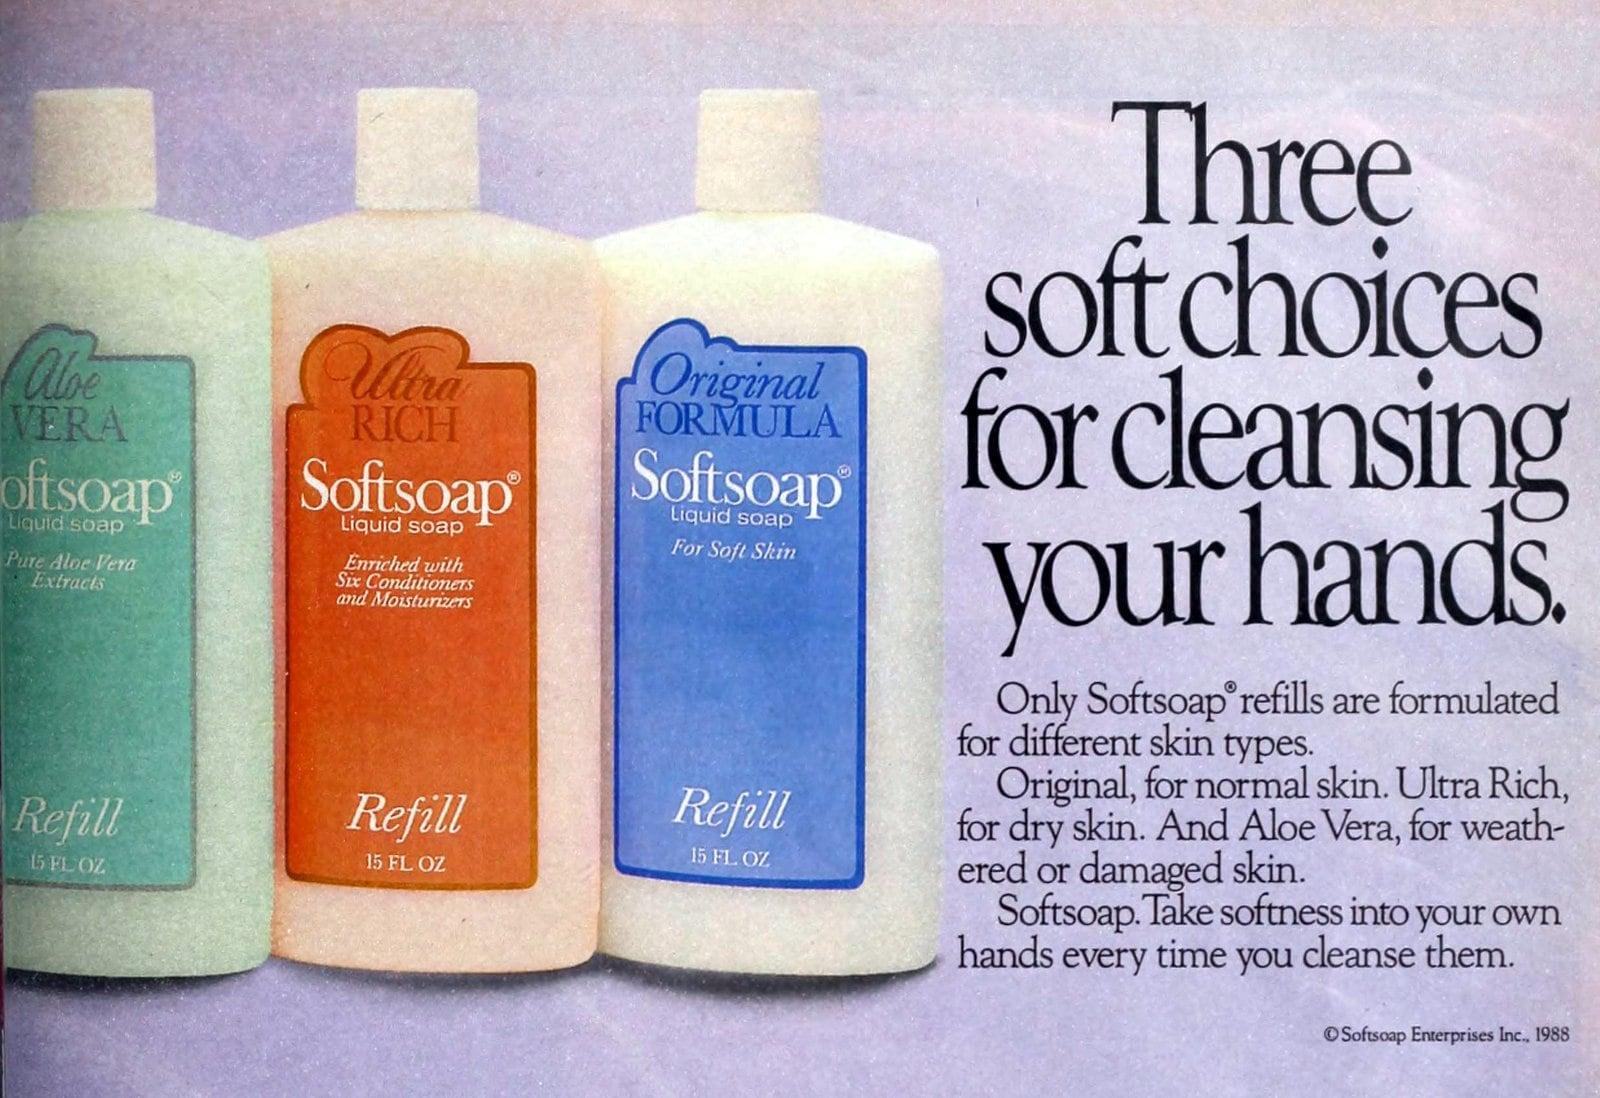 Softsoap refills (1988)